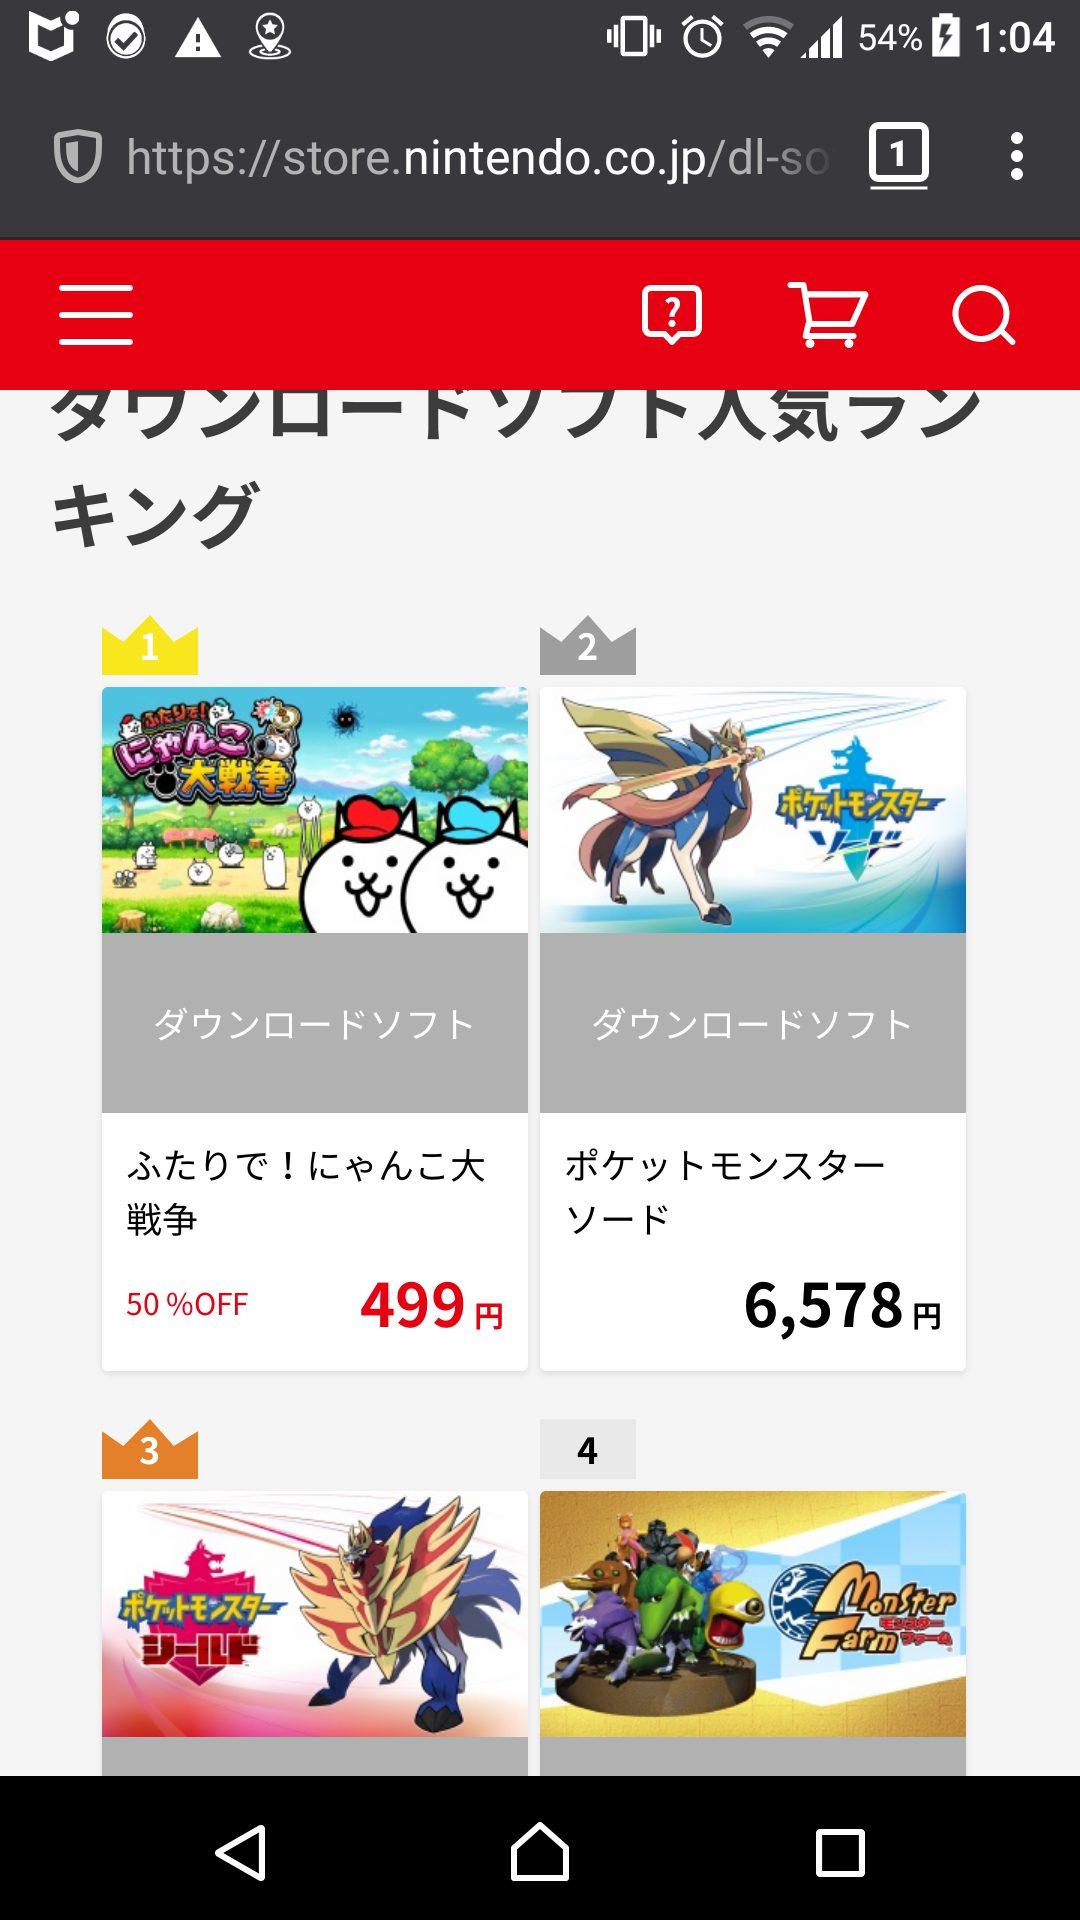 dotup.org2024155 - Switch『ポケモン ソード・シールド』、クリスマス週なのに売上ランキング首位陥落